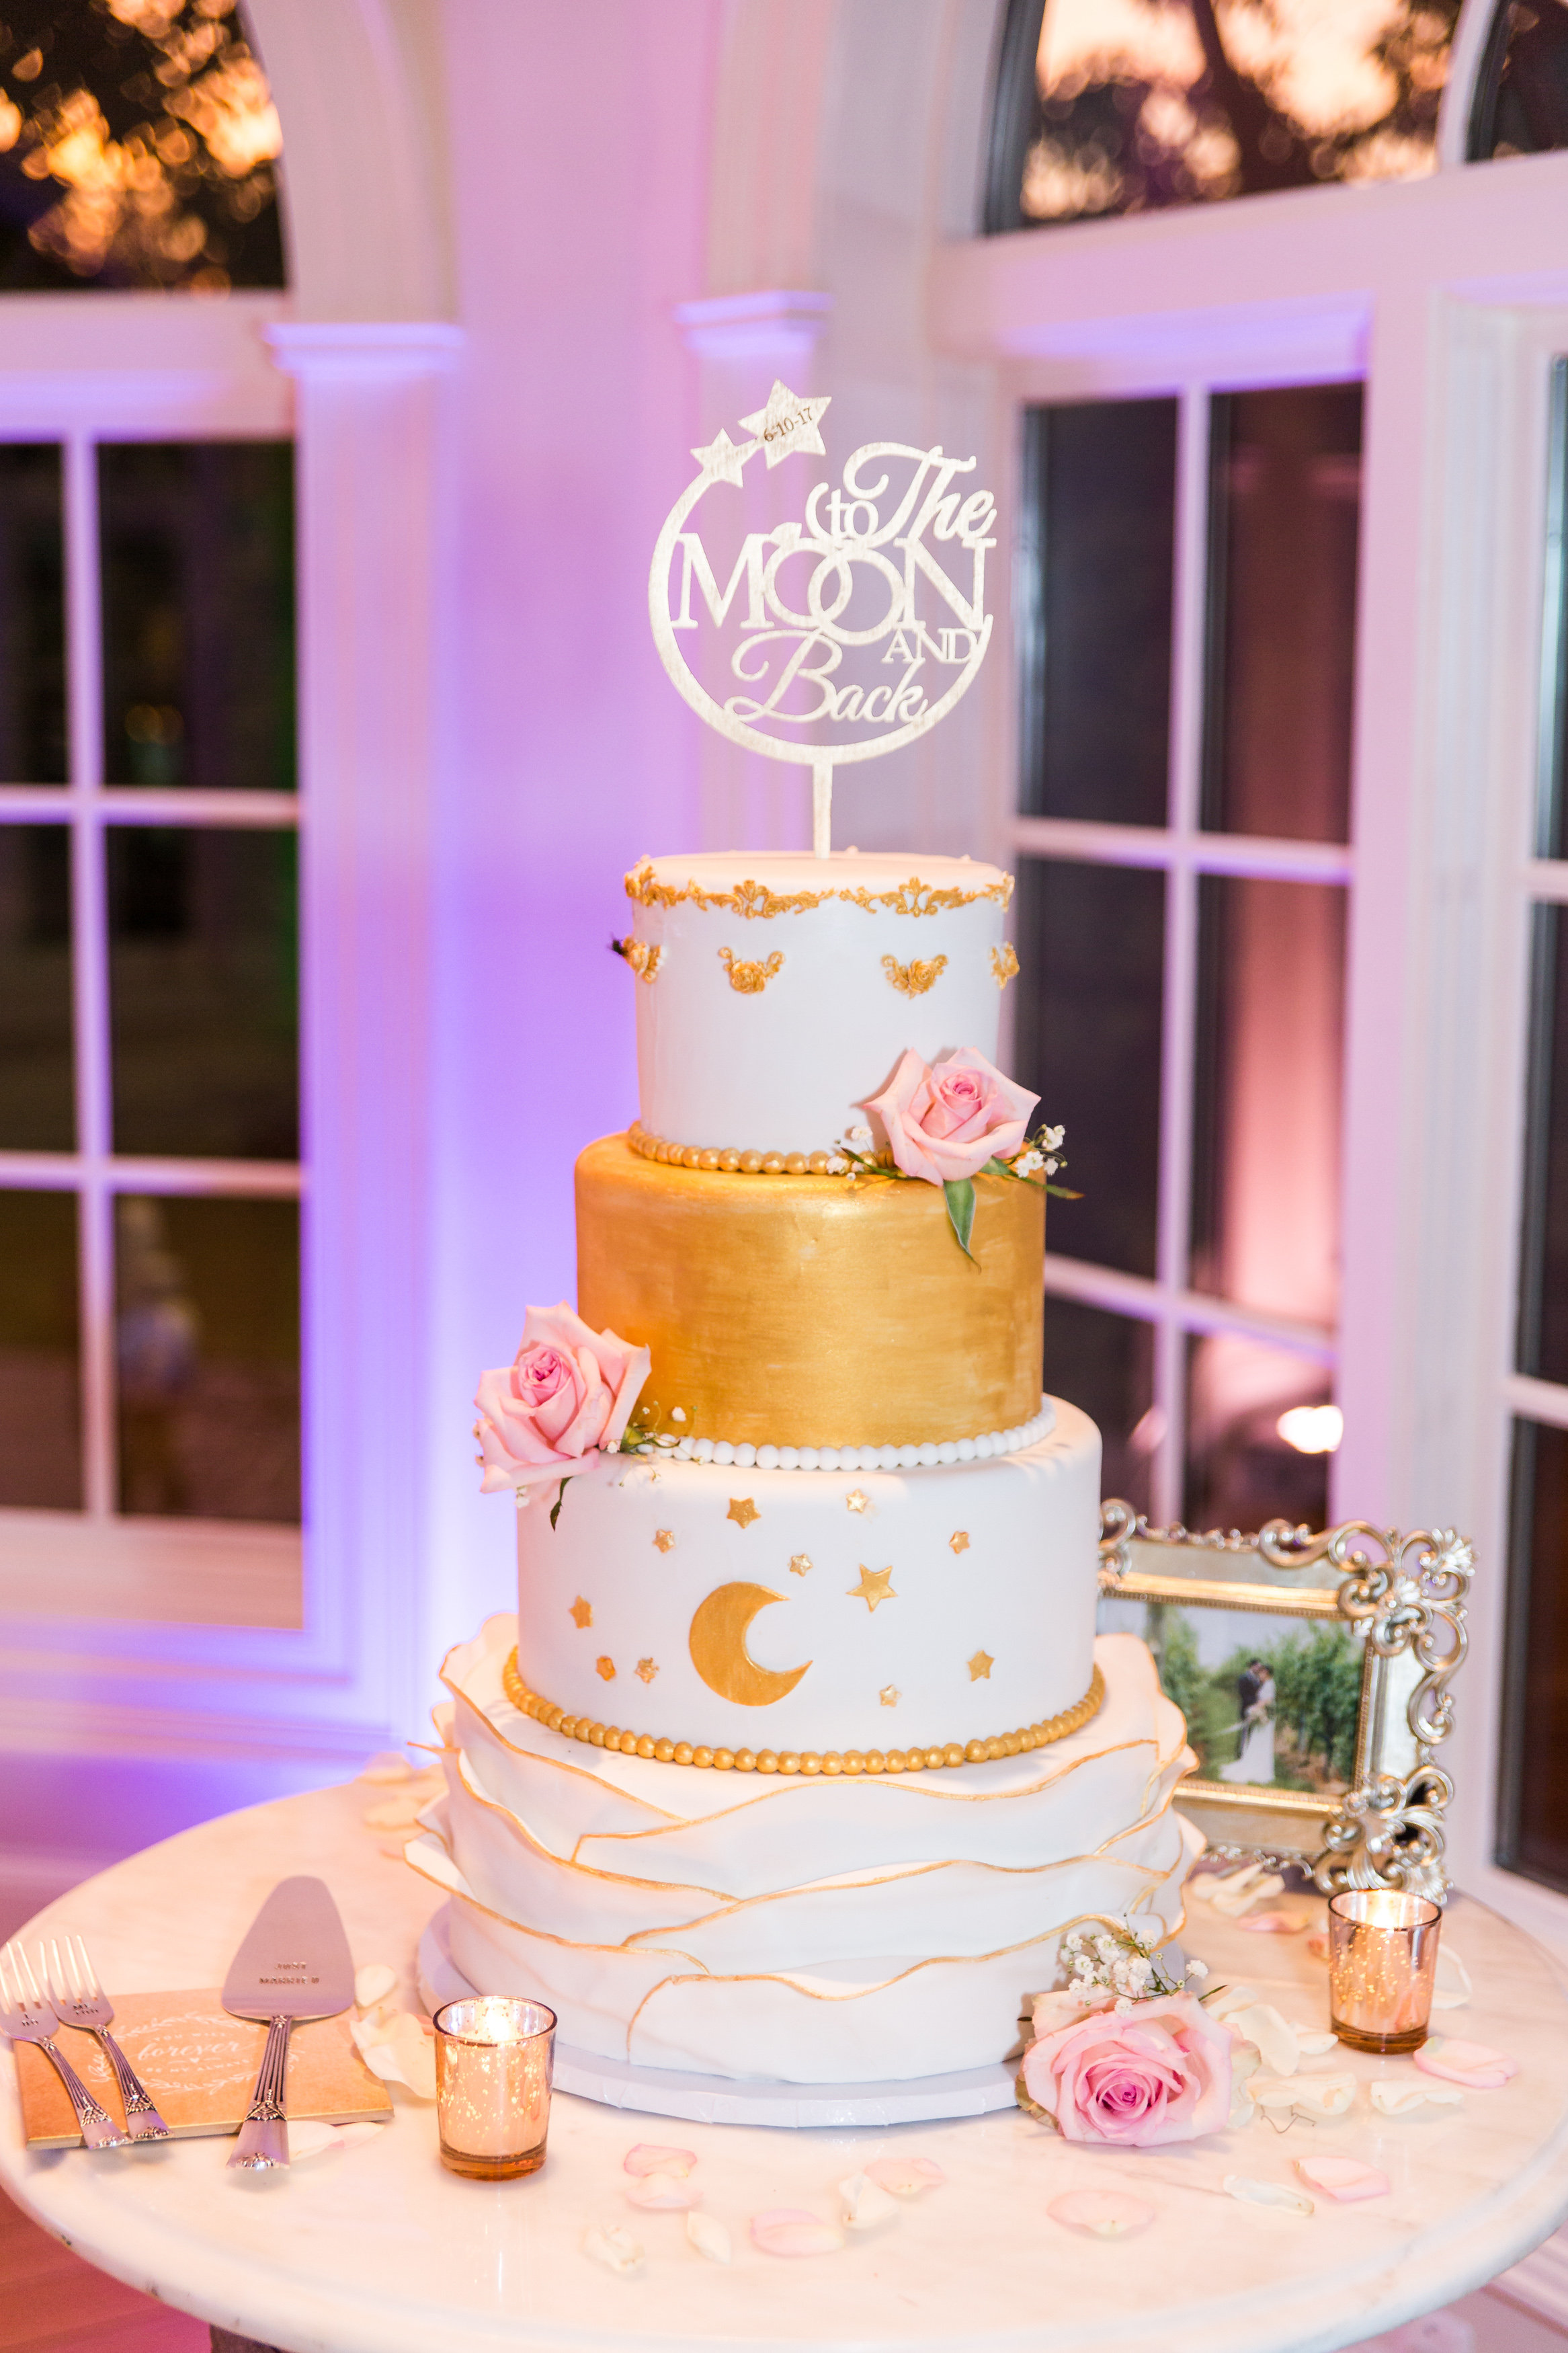 Celestial cake